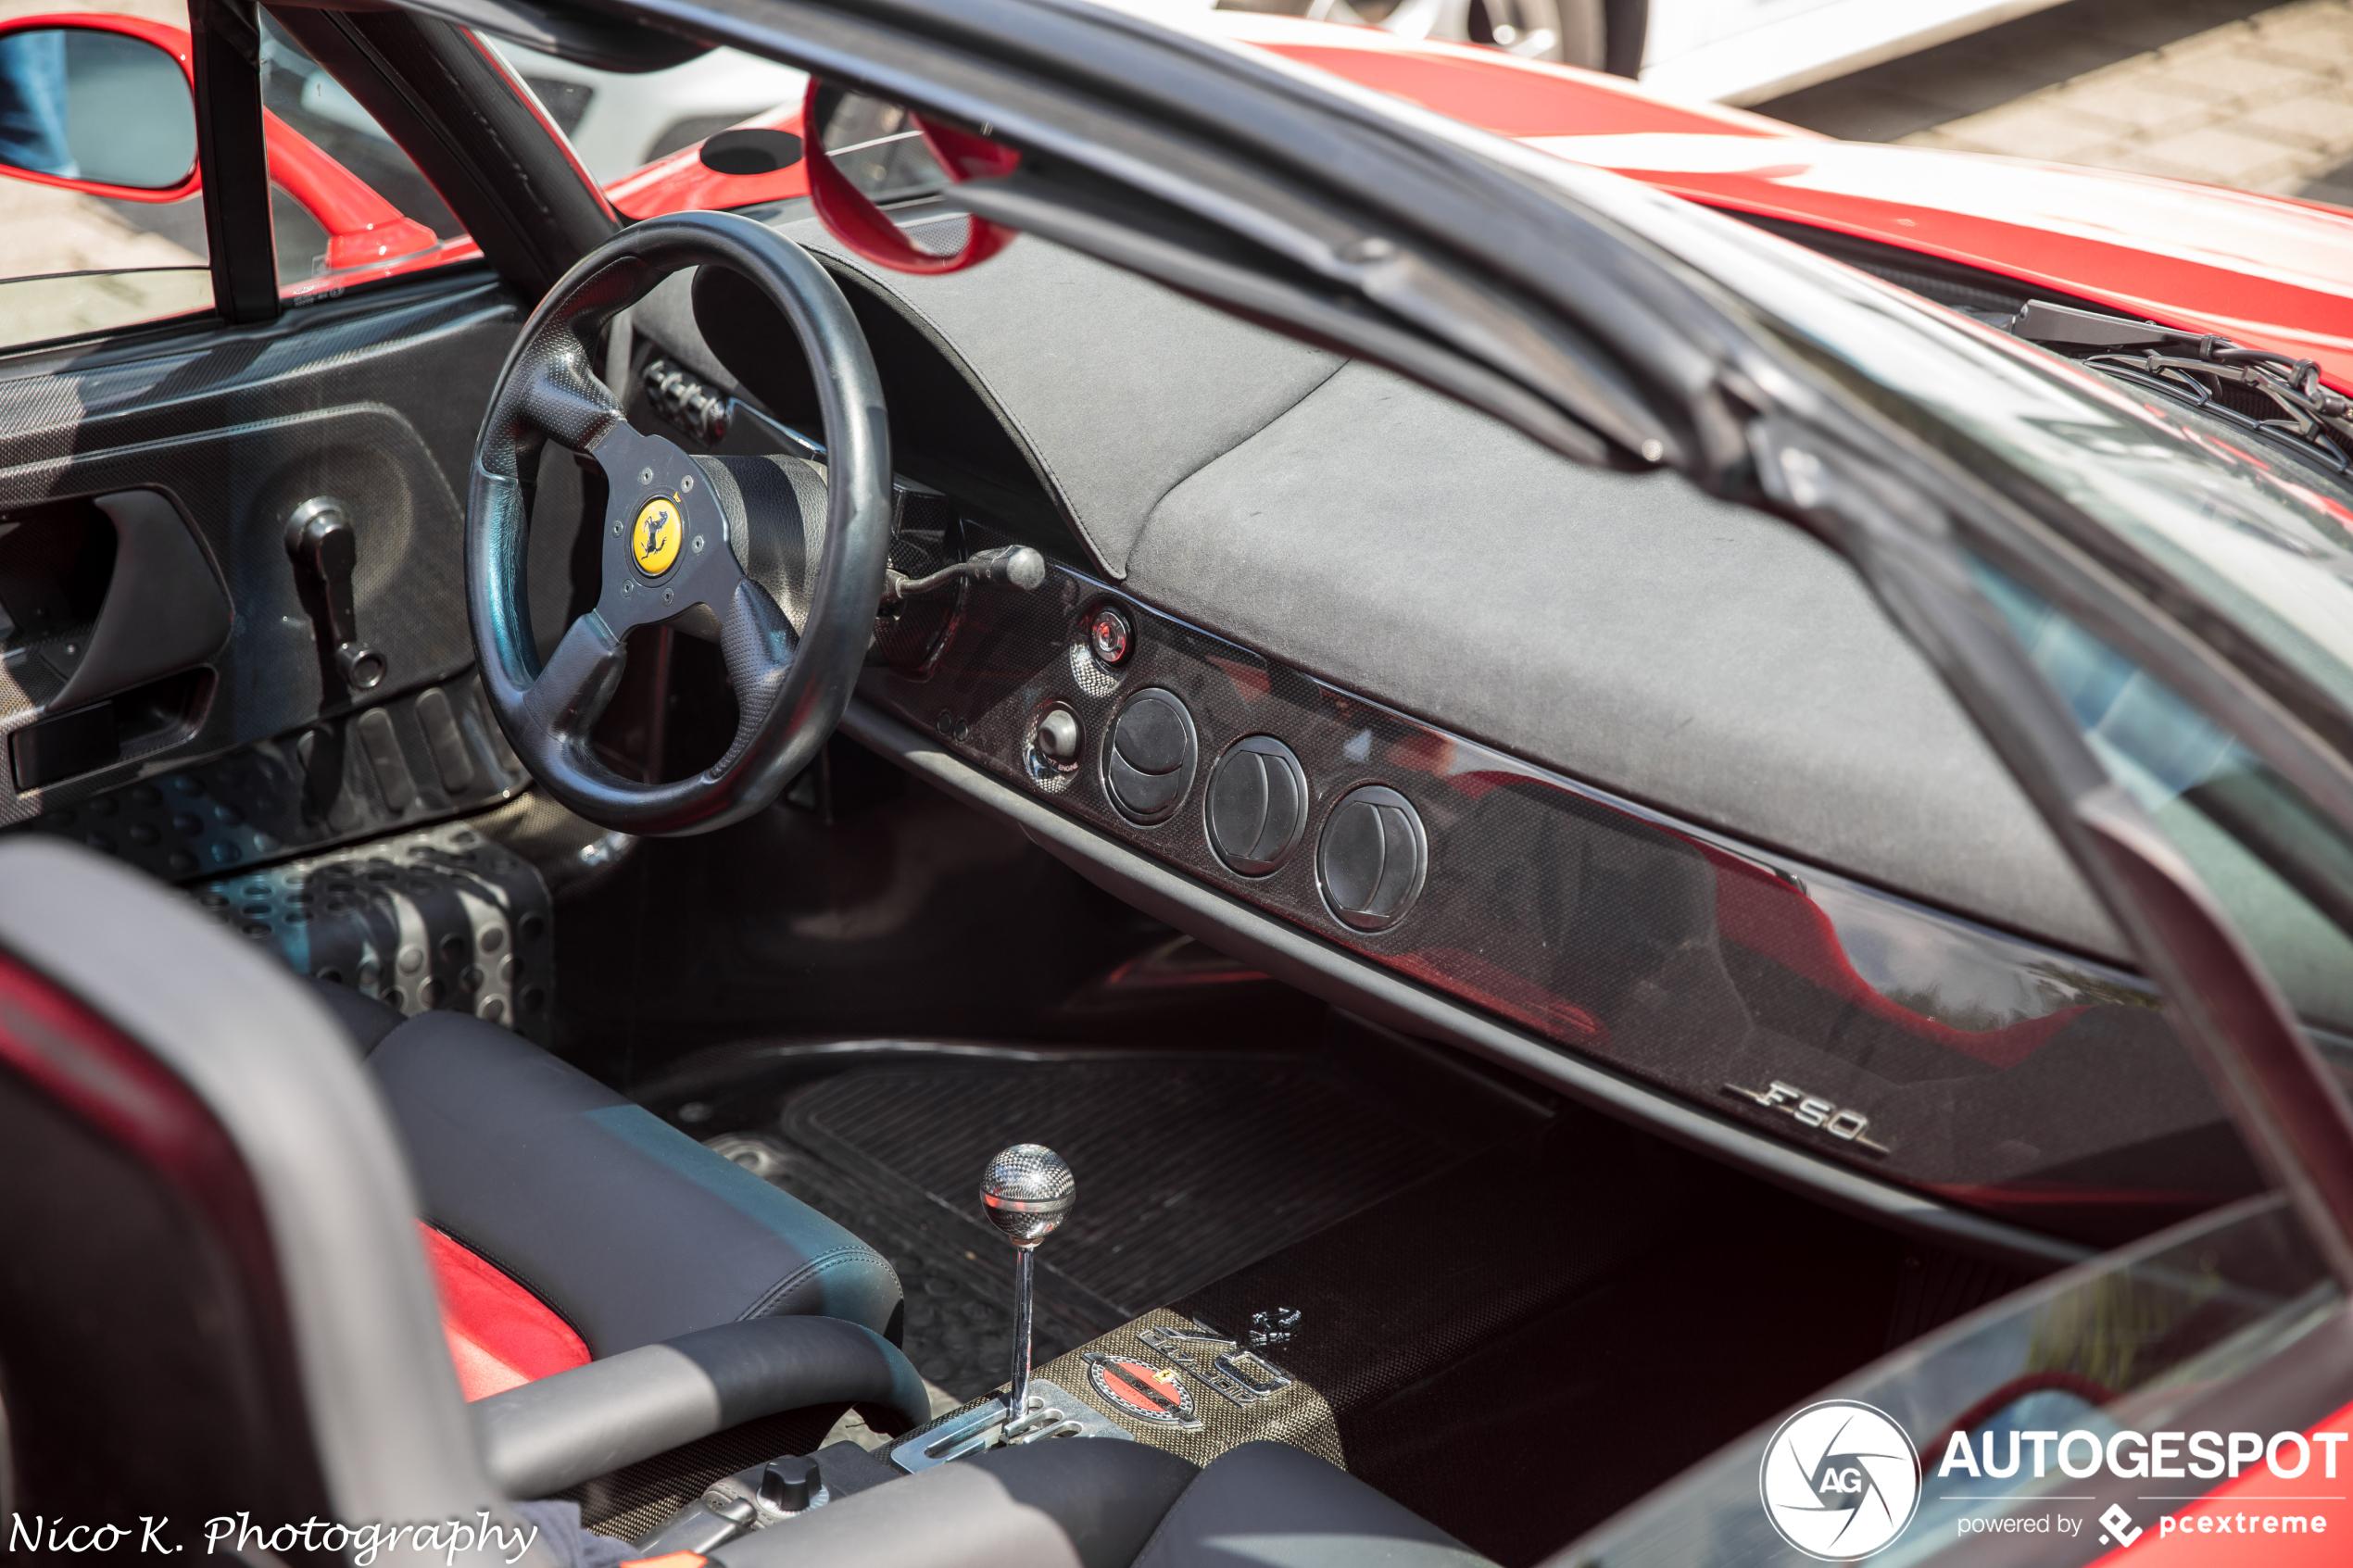 Ferrari F50 26 April 2020 Autogespot